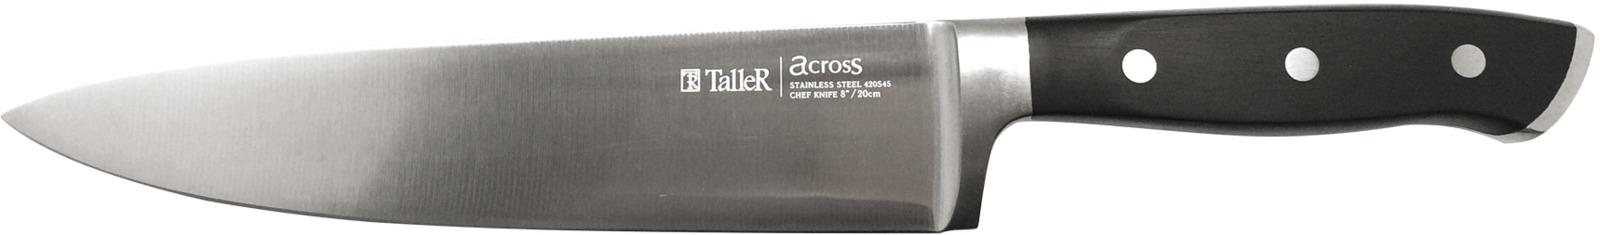 Нож поварской Taller, длина лезвия 20 см. TR-2020 нож универсальный taller длина лезвия 13 см tr 2048